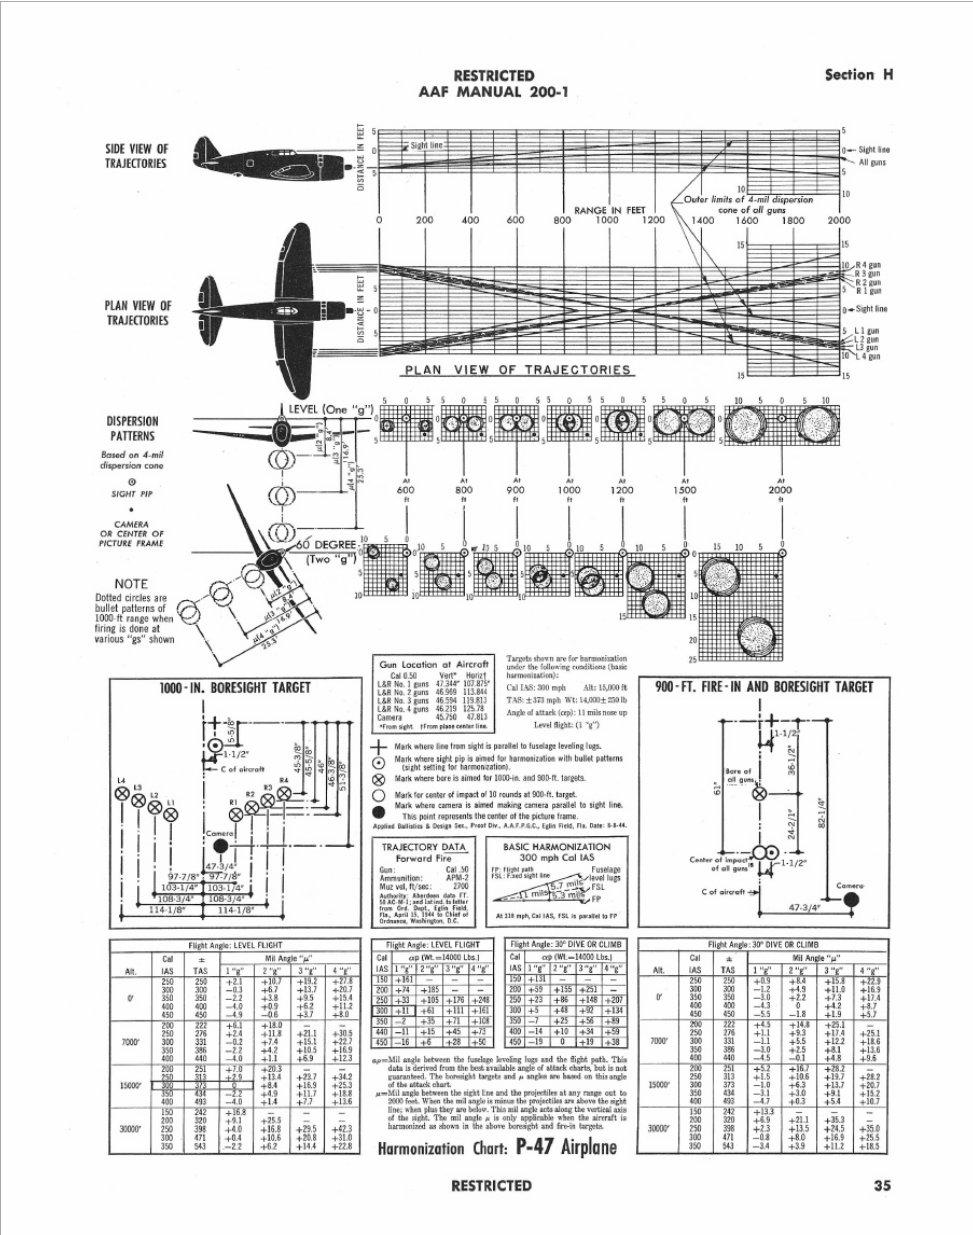 P-47_gun_harmonization_1945_page_35.jpg